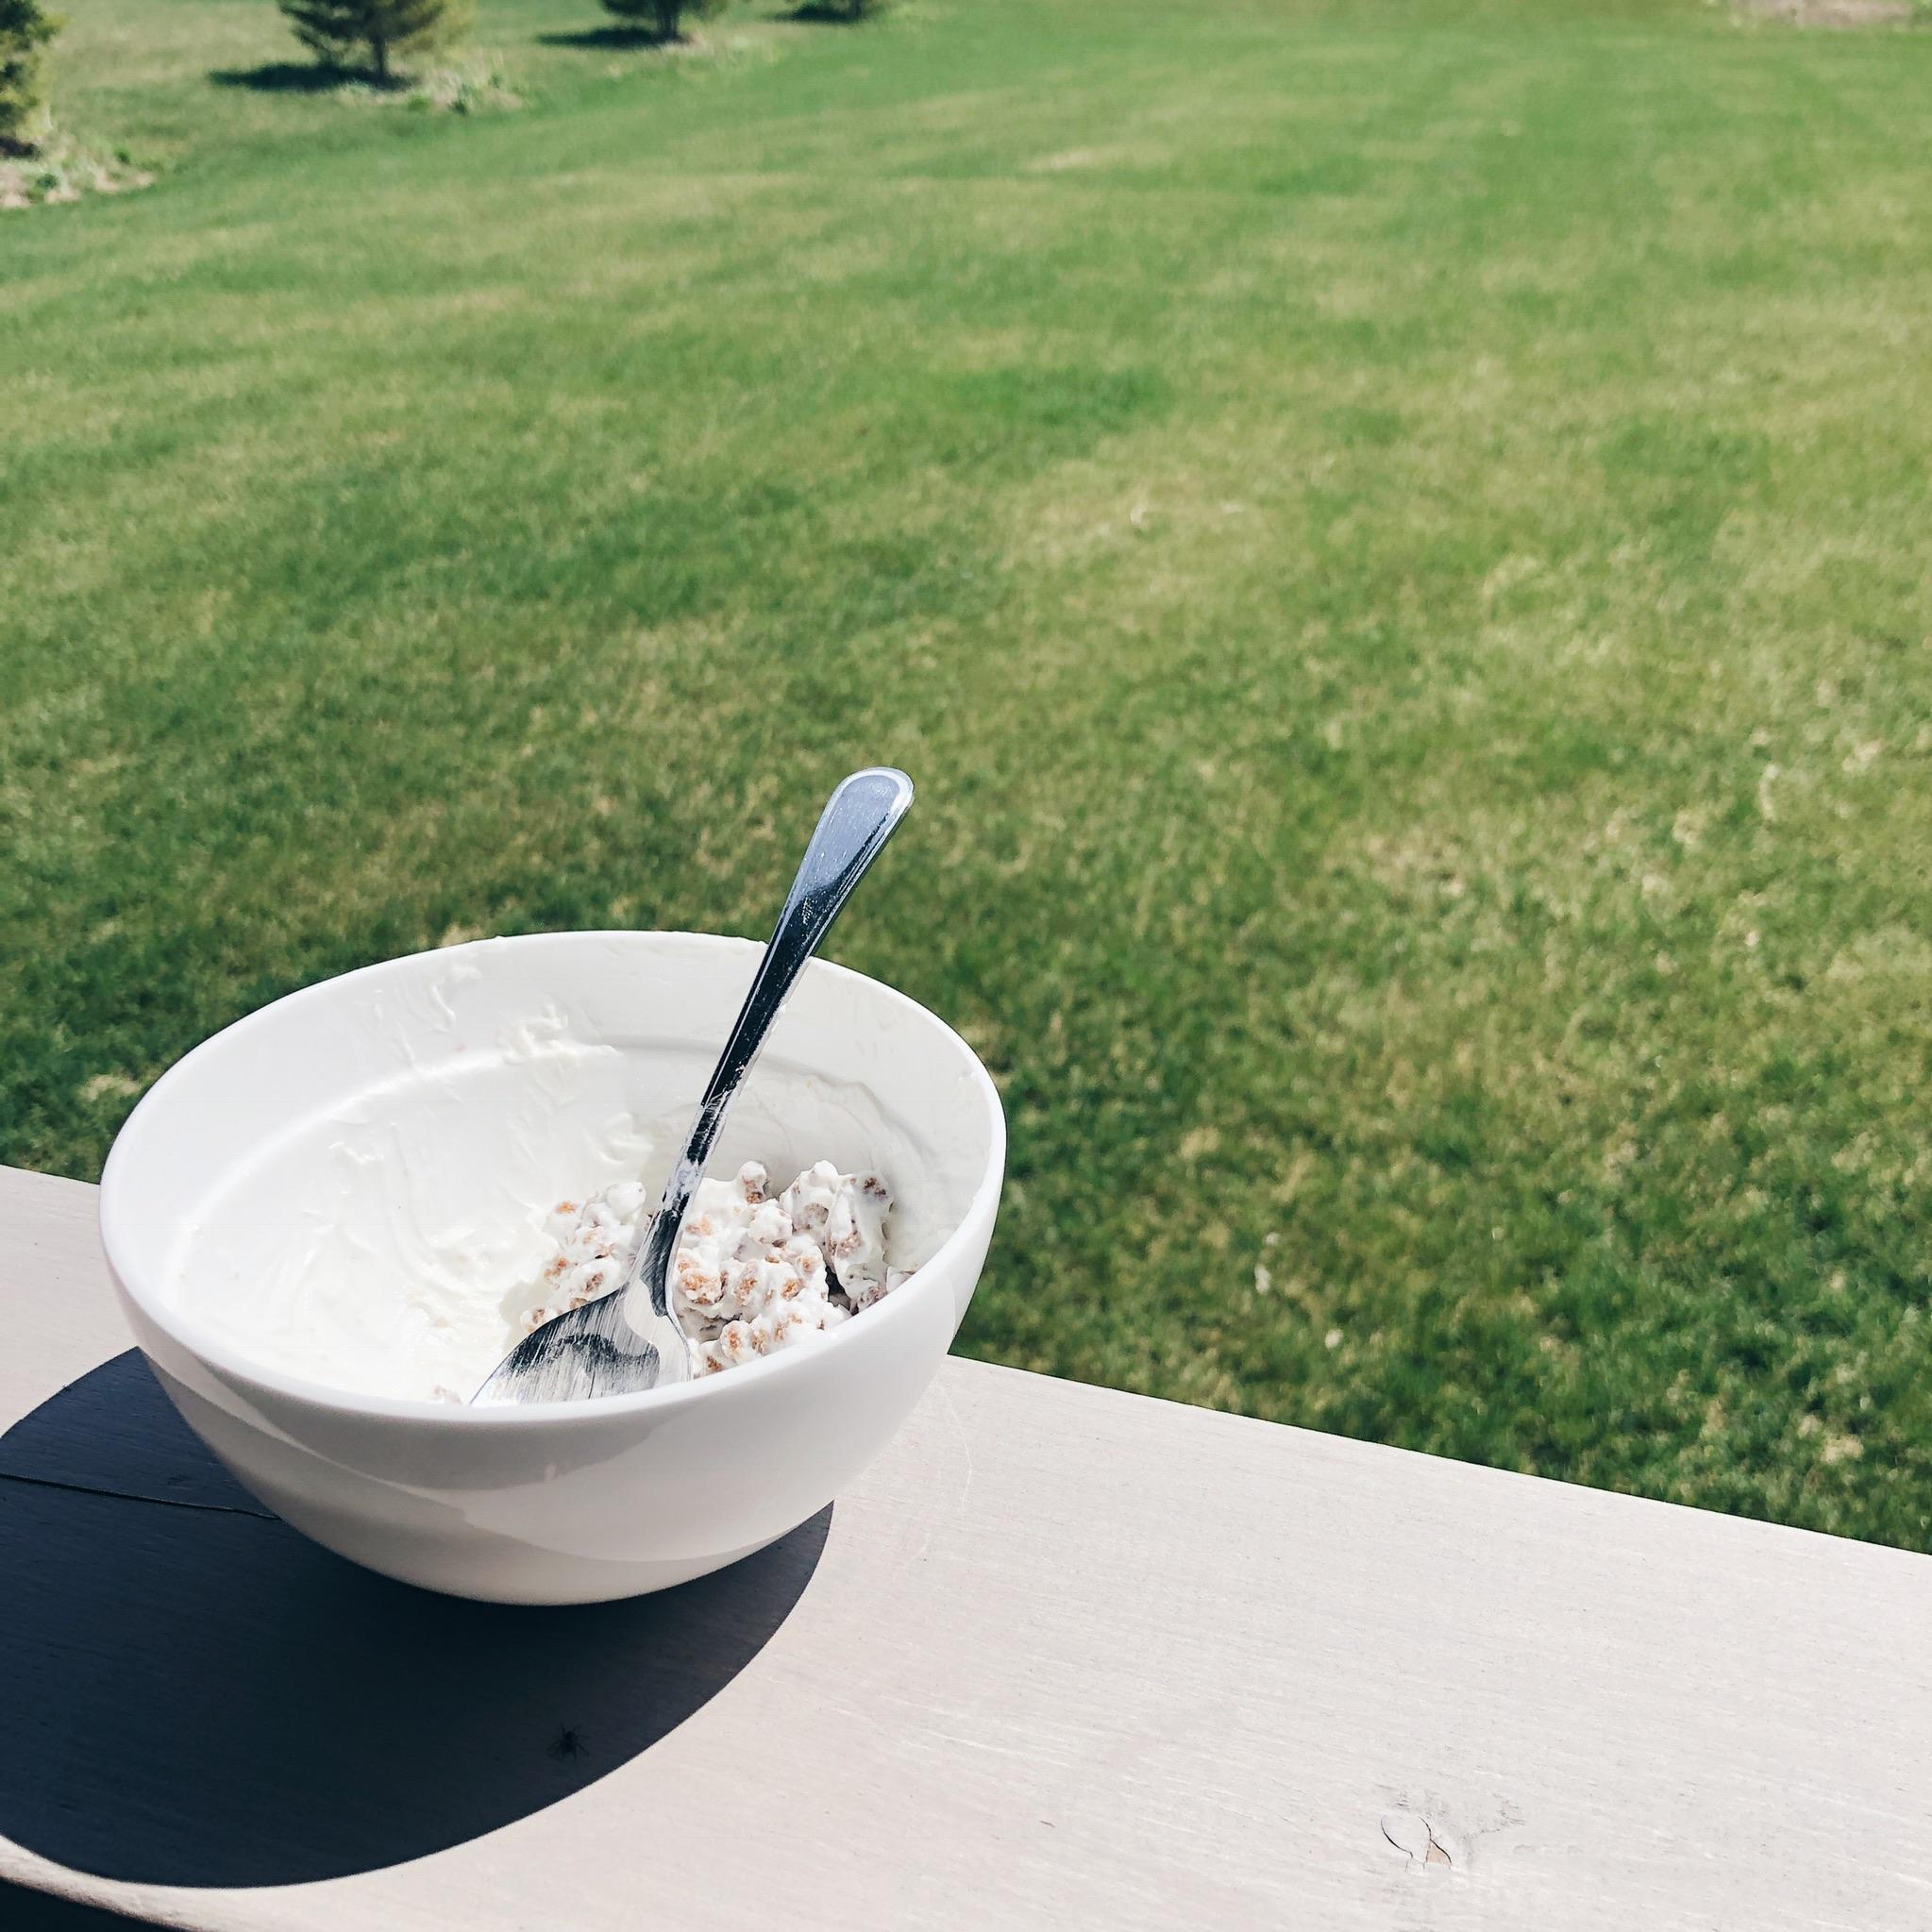 bowl of bran buds, summer deck